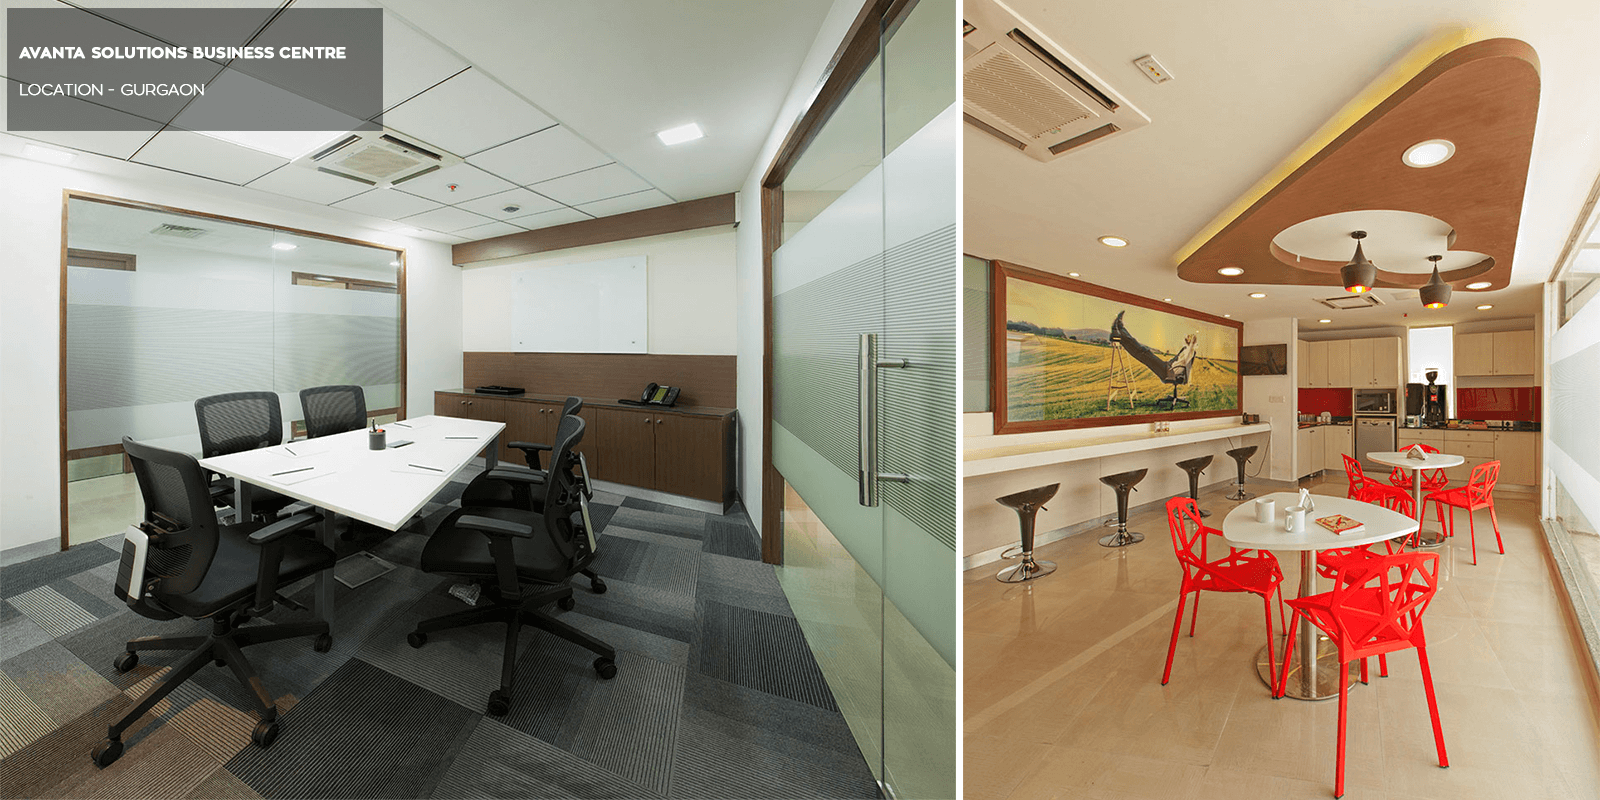 avanta-business-centre-the-novarch-architects-best-architects-in-cr-park-south-delhi-110019